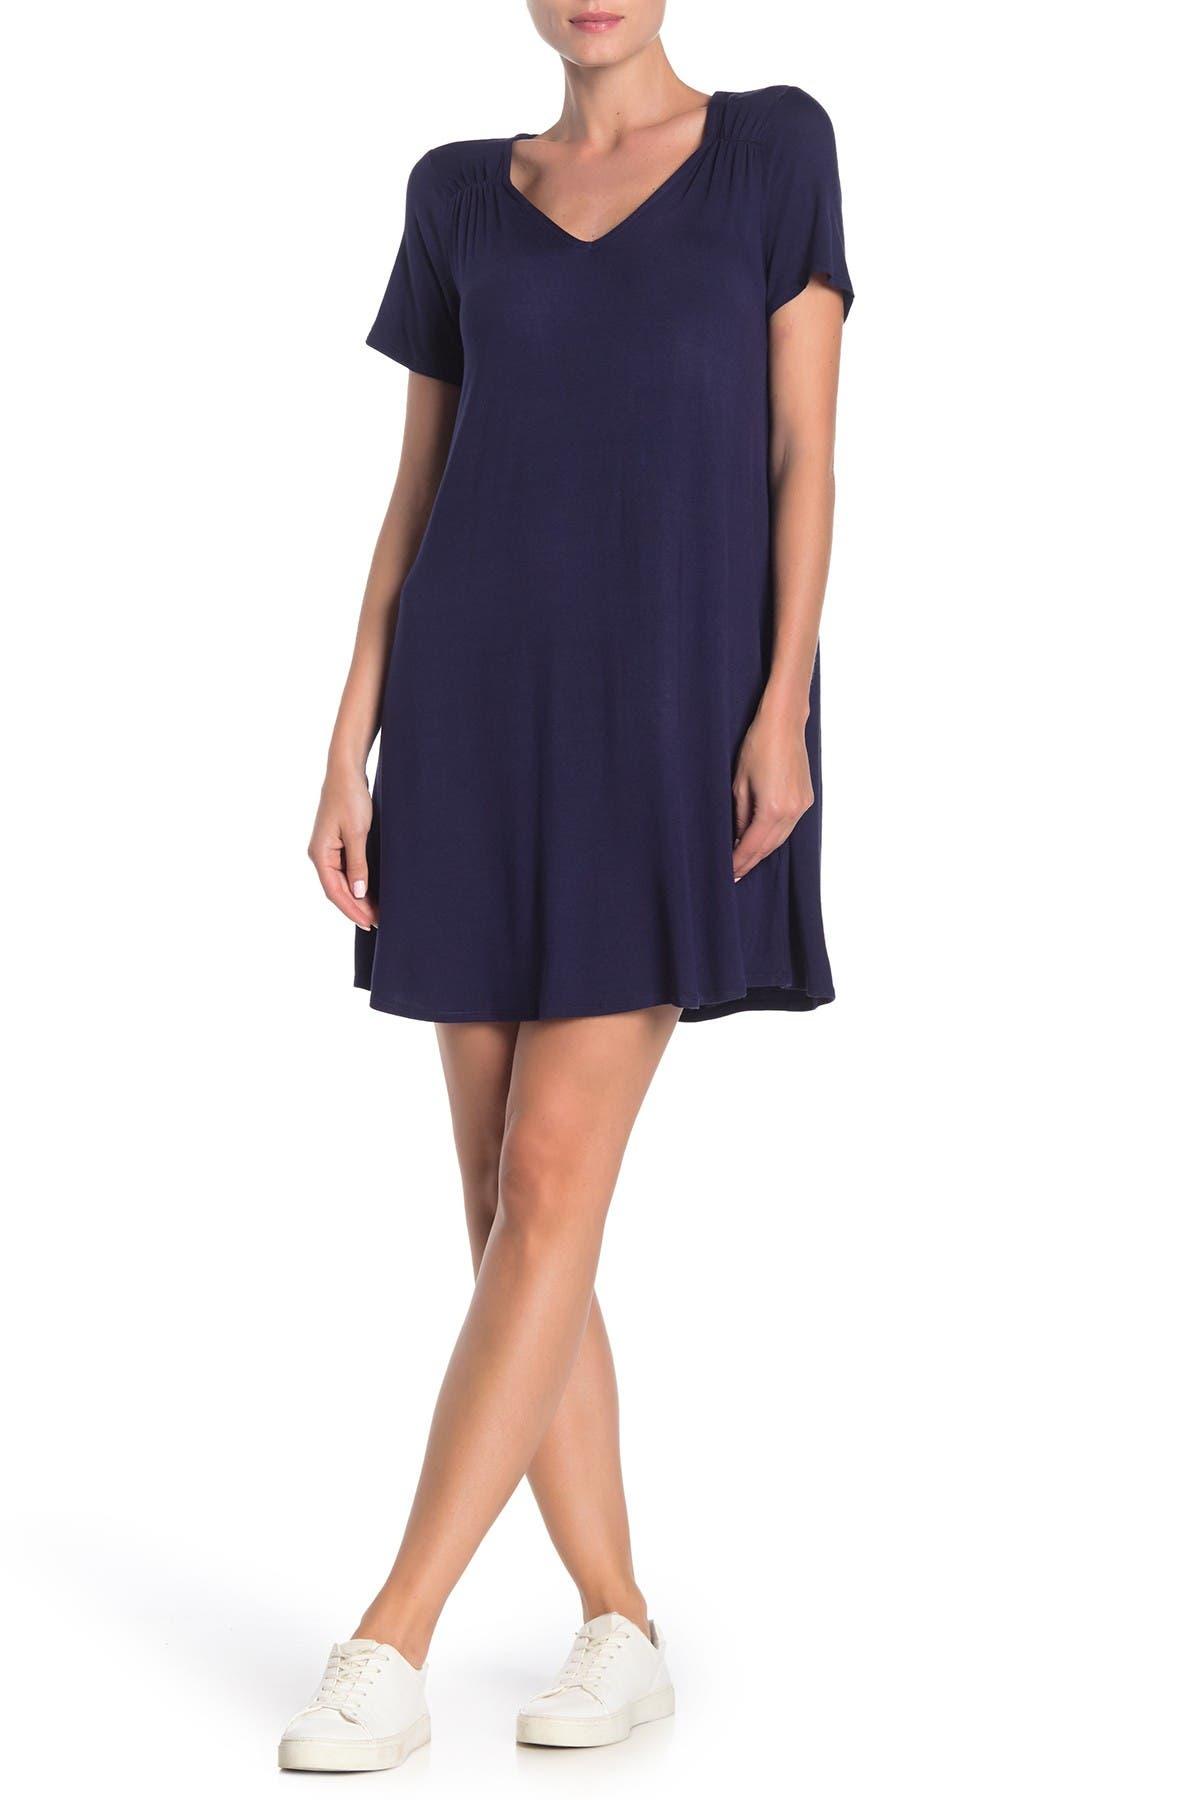 Image of Love, Fire V-Neck Knit T-Shirt Dress